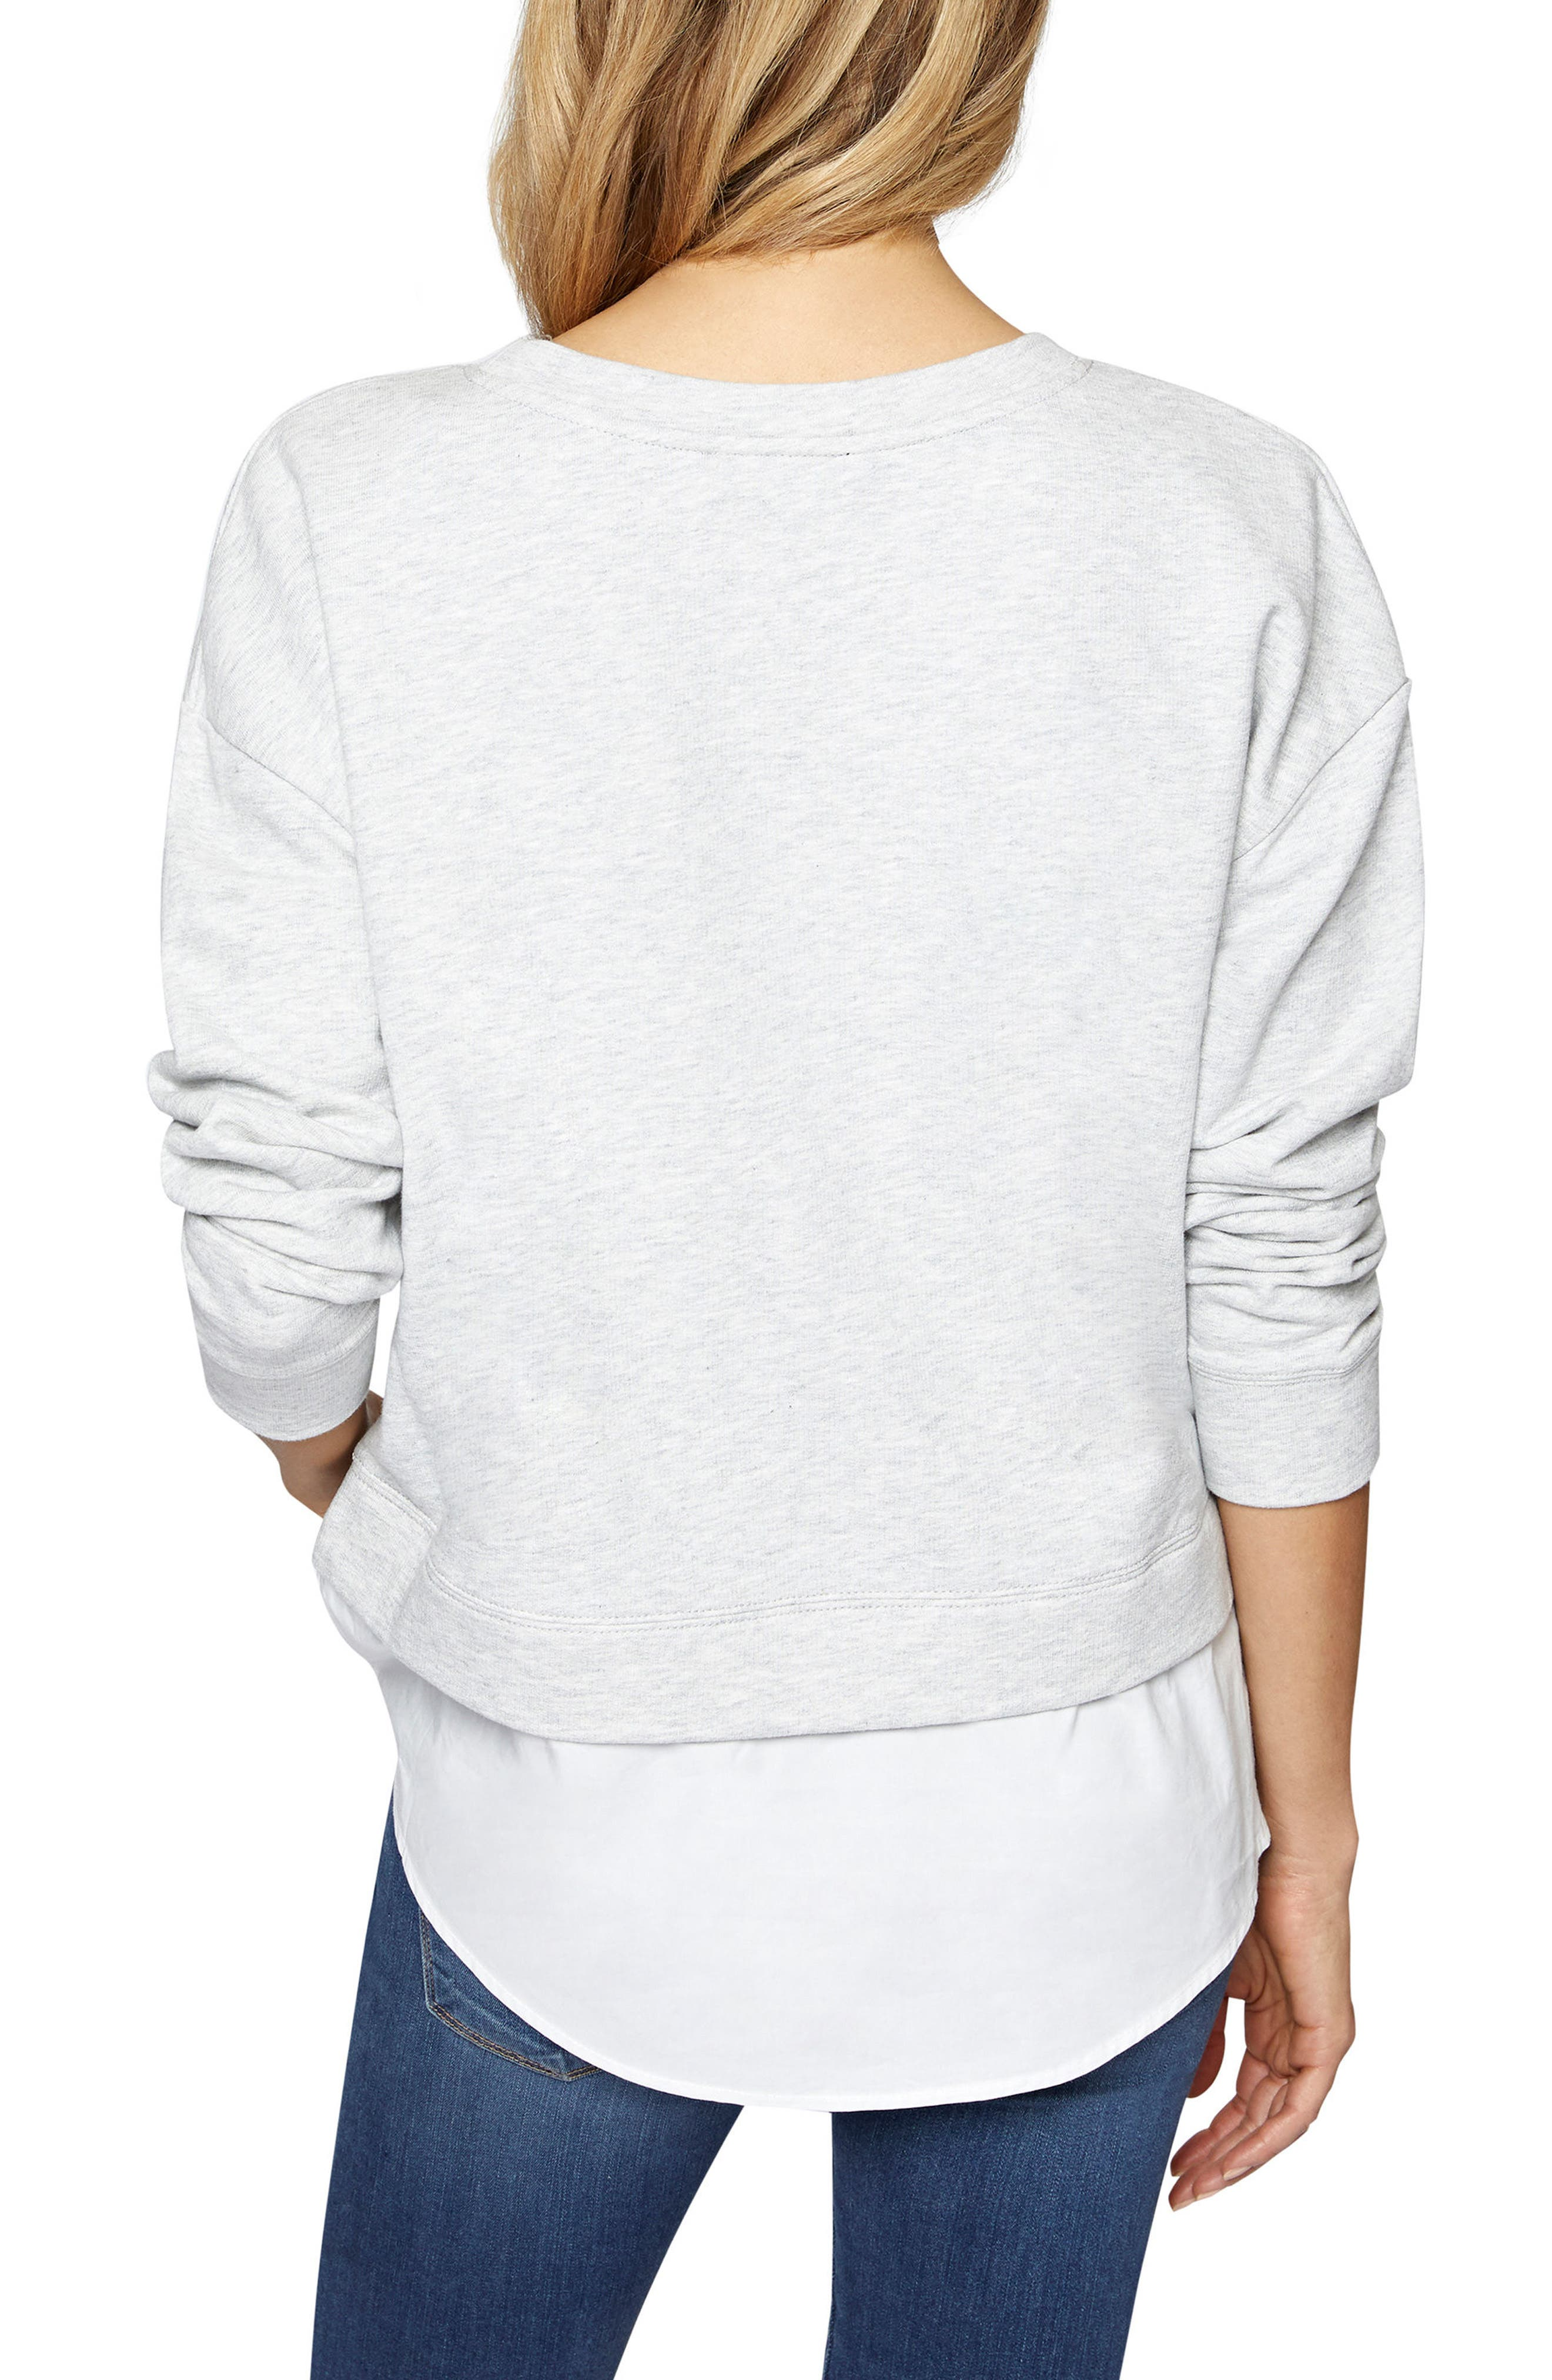 Alternate Image 2  - Sanctuary Ally Layered Look Sweatshirt